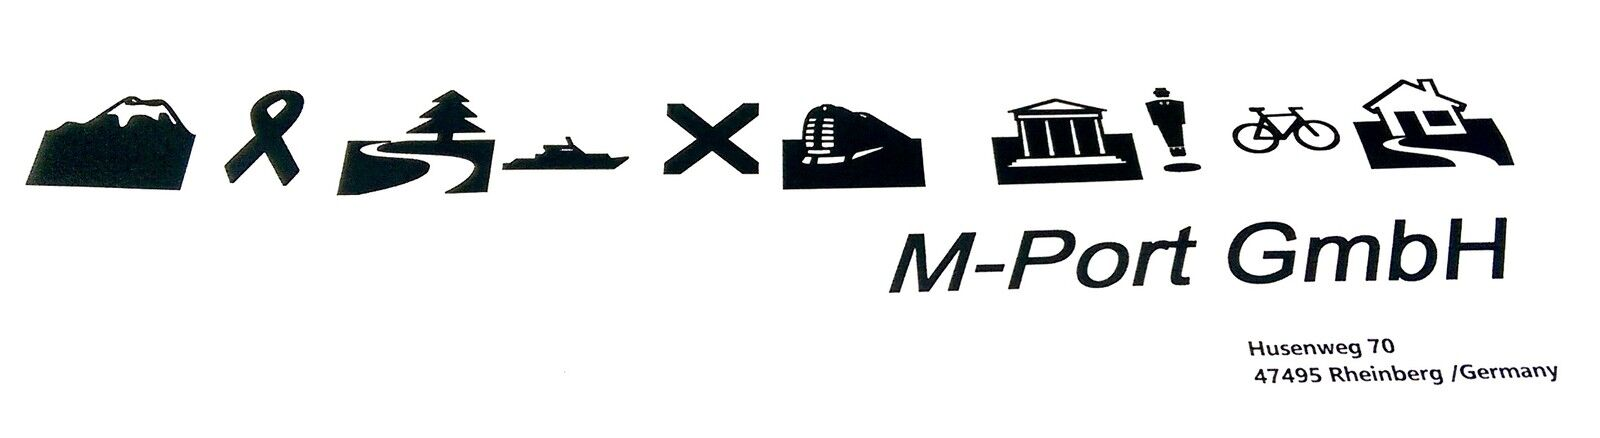 m-port